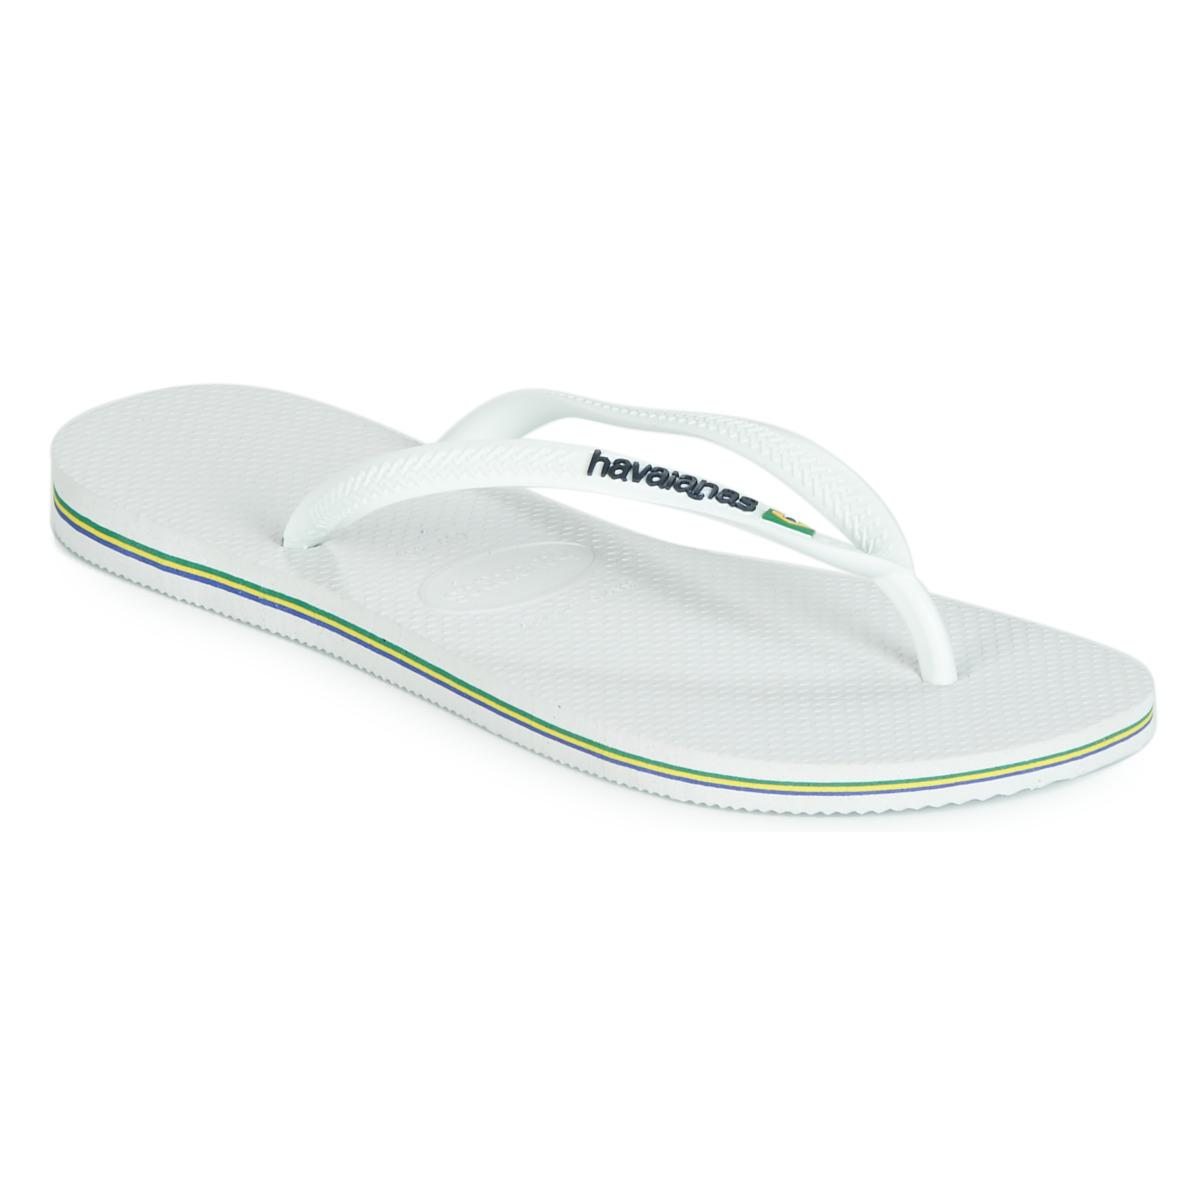 e838683d144a Havaianas Slim Brasil Logo Flip Flops   Sandals (shoes) in White - Lyst